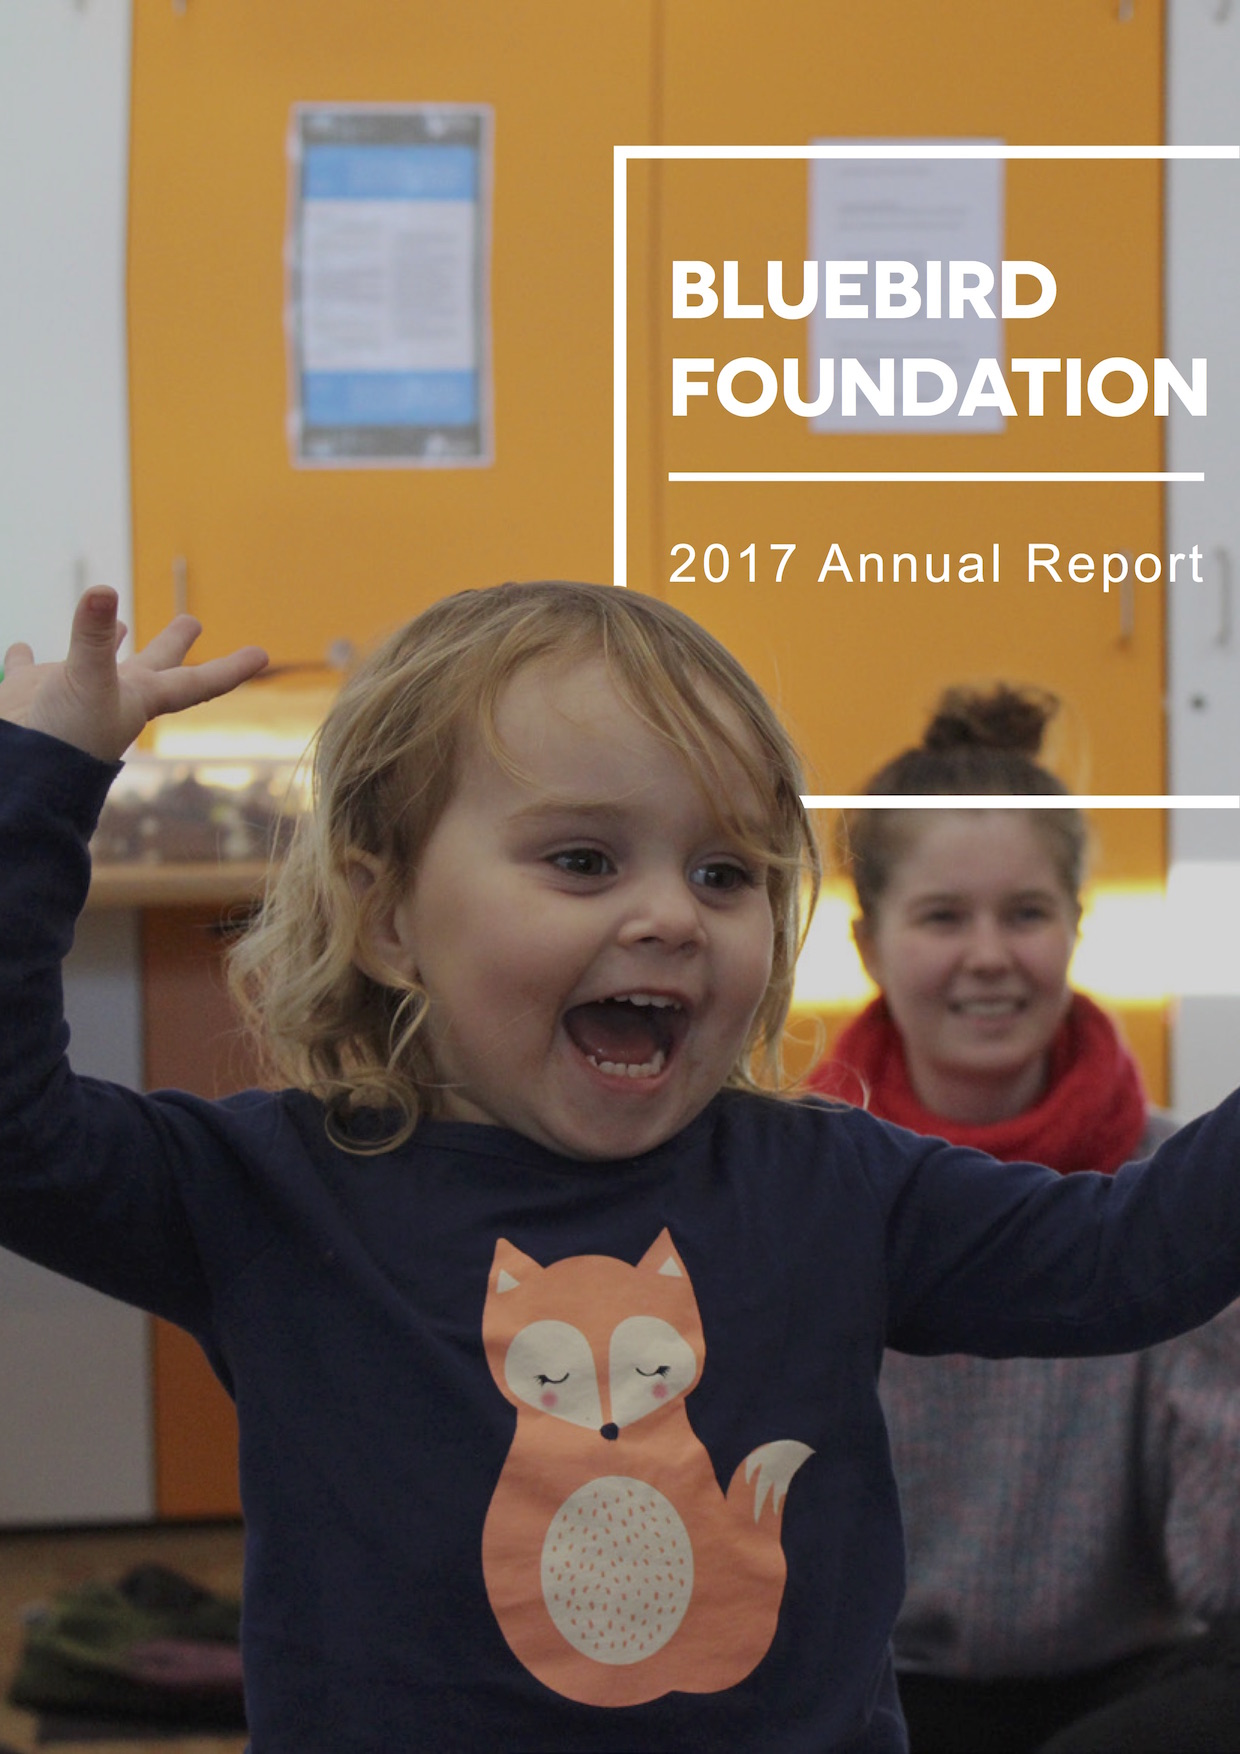 Bluebird Foundation 2017 Annual Report